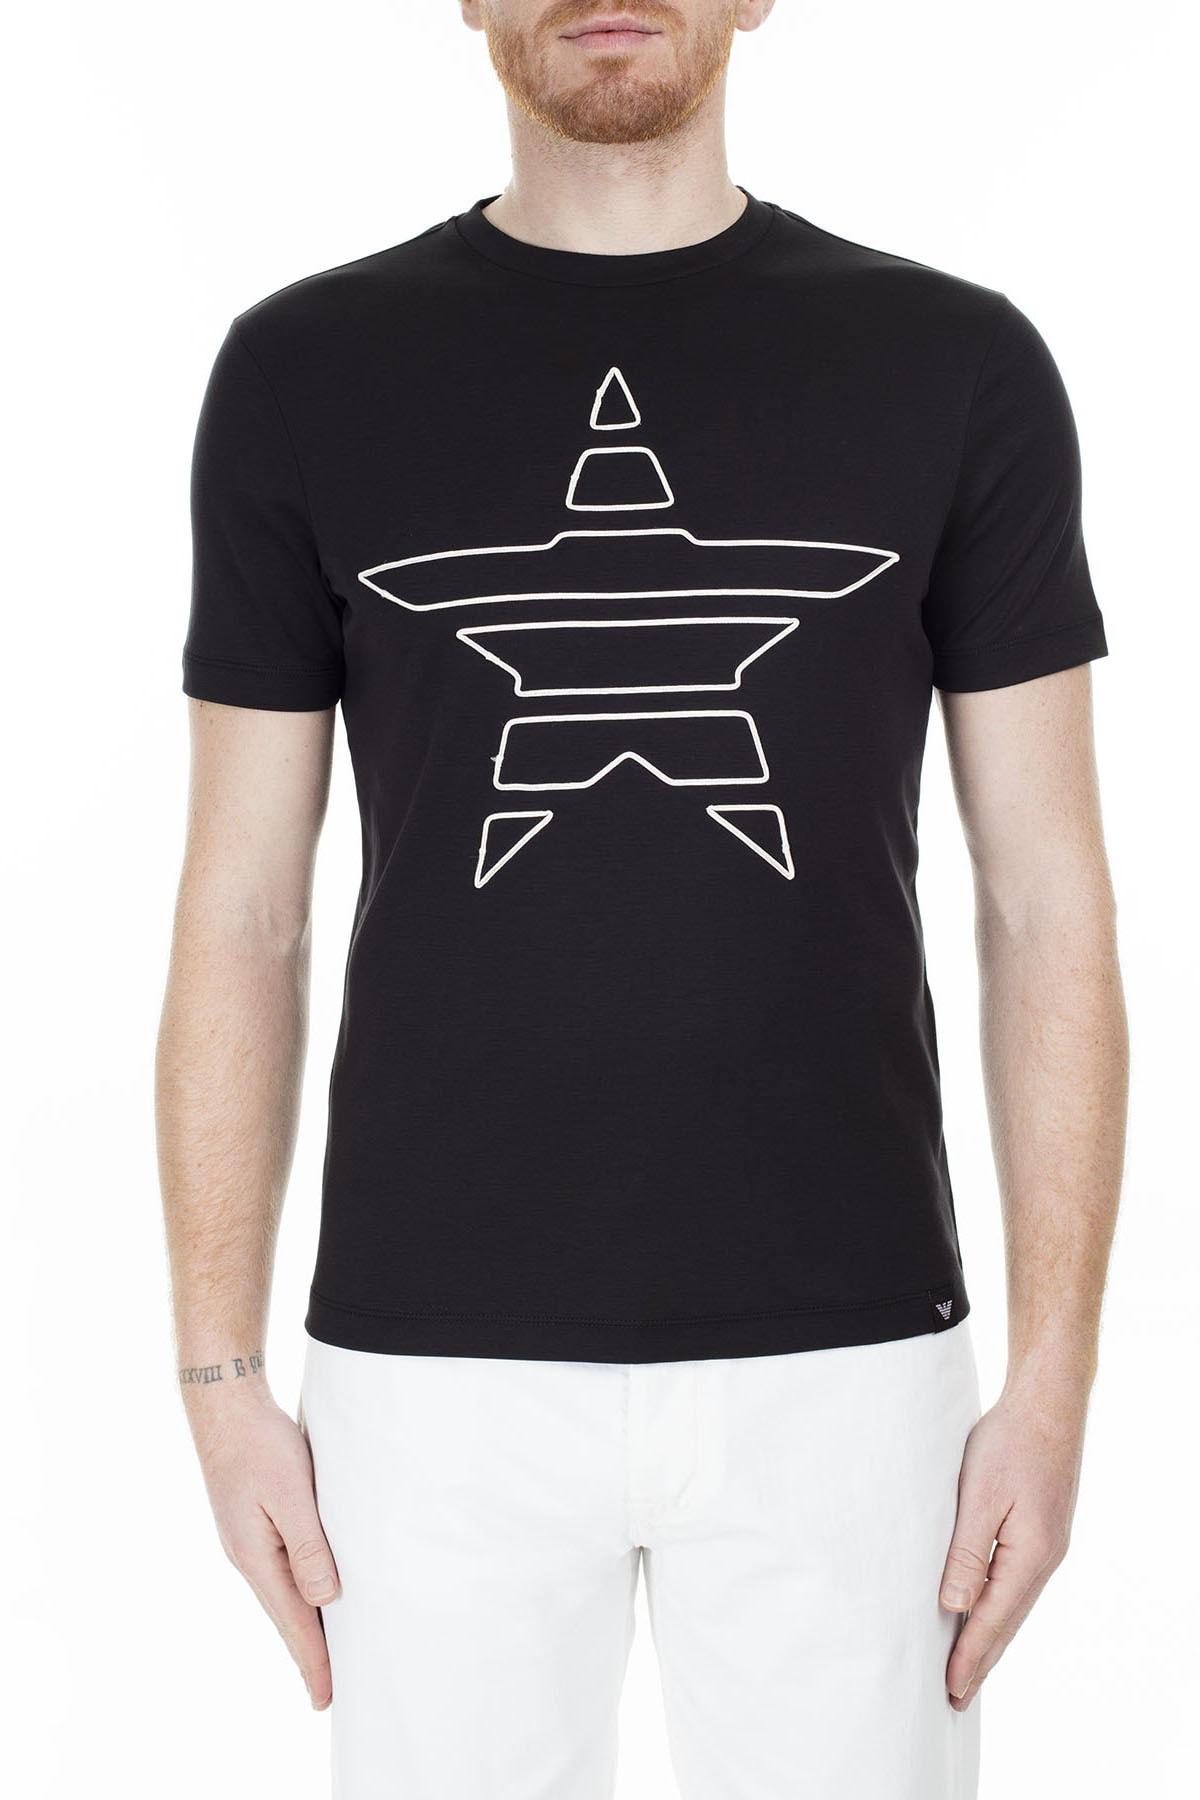 Emporio Armani T Shirt Erkek T Shirt S 6G1Te2 1Jprz 0002 S 6G1TE2 1JPRZ 0002